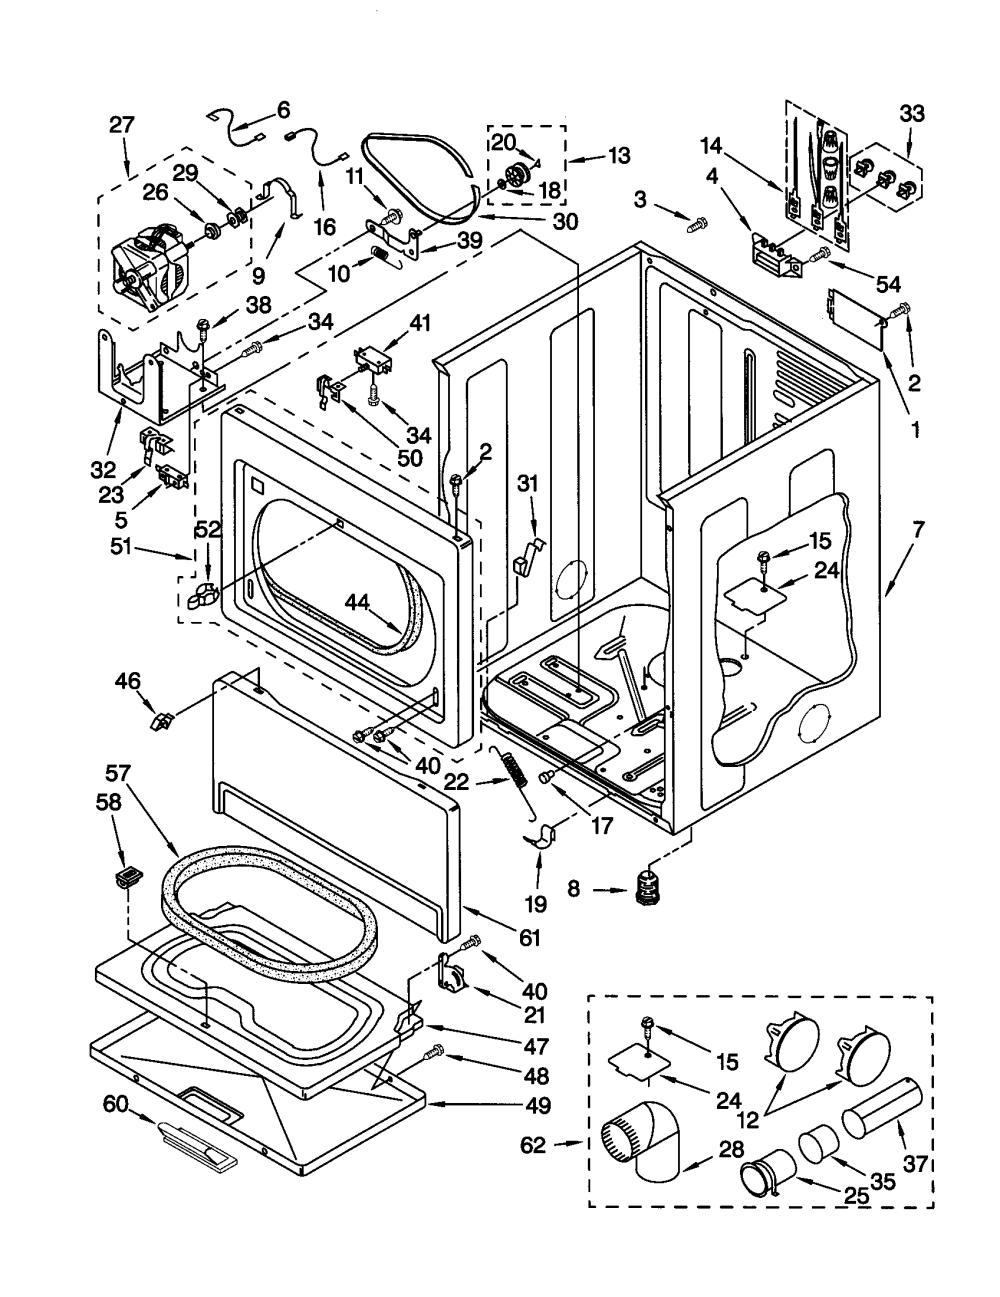 medium resolution of 110 kenmore electric dryer wiring diagram kenmore gas dryer model 110